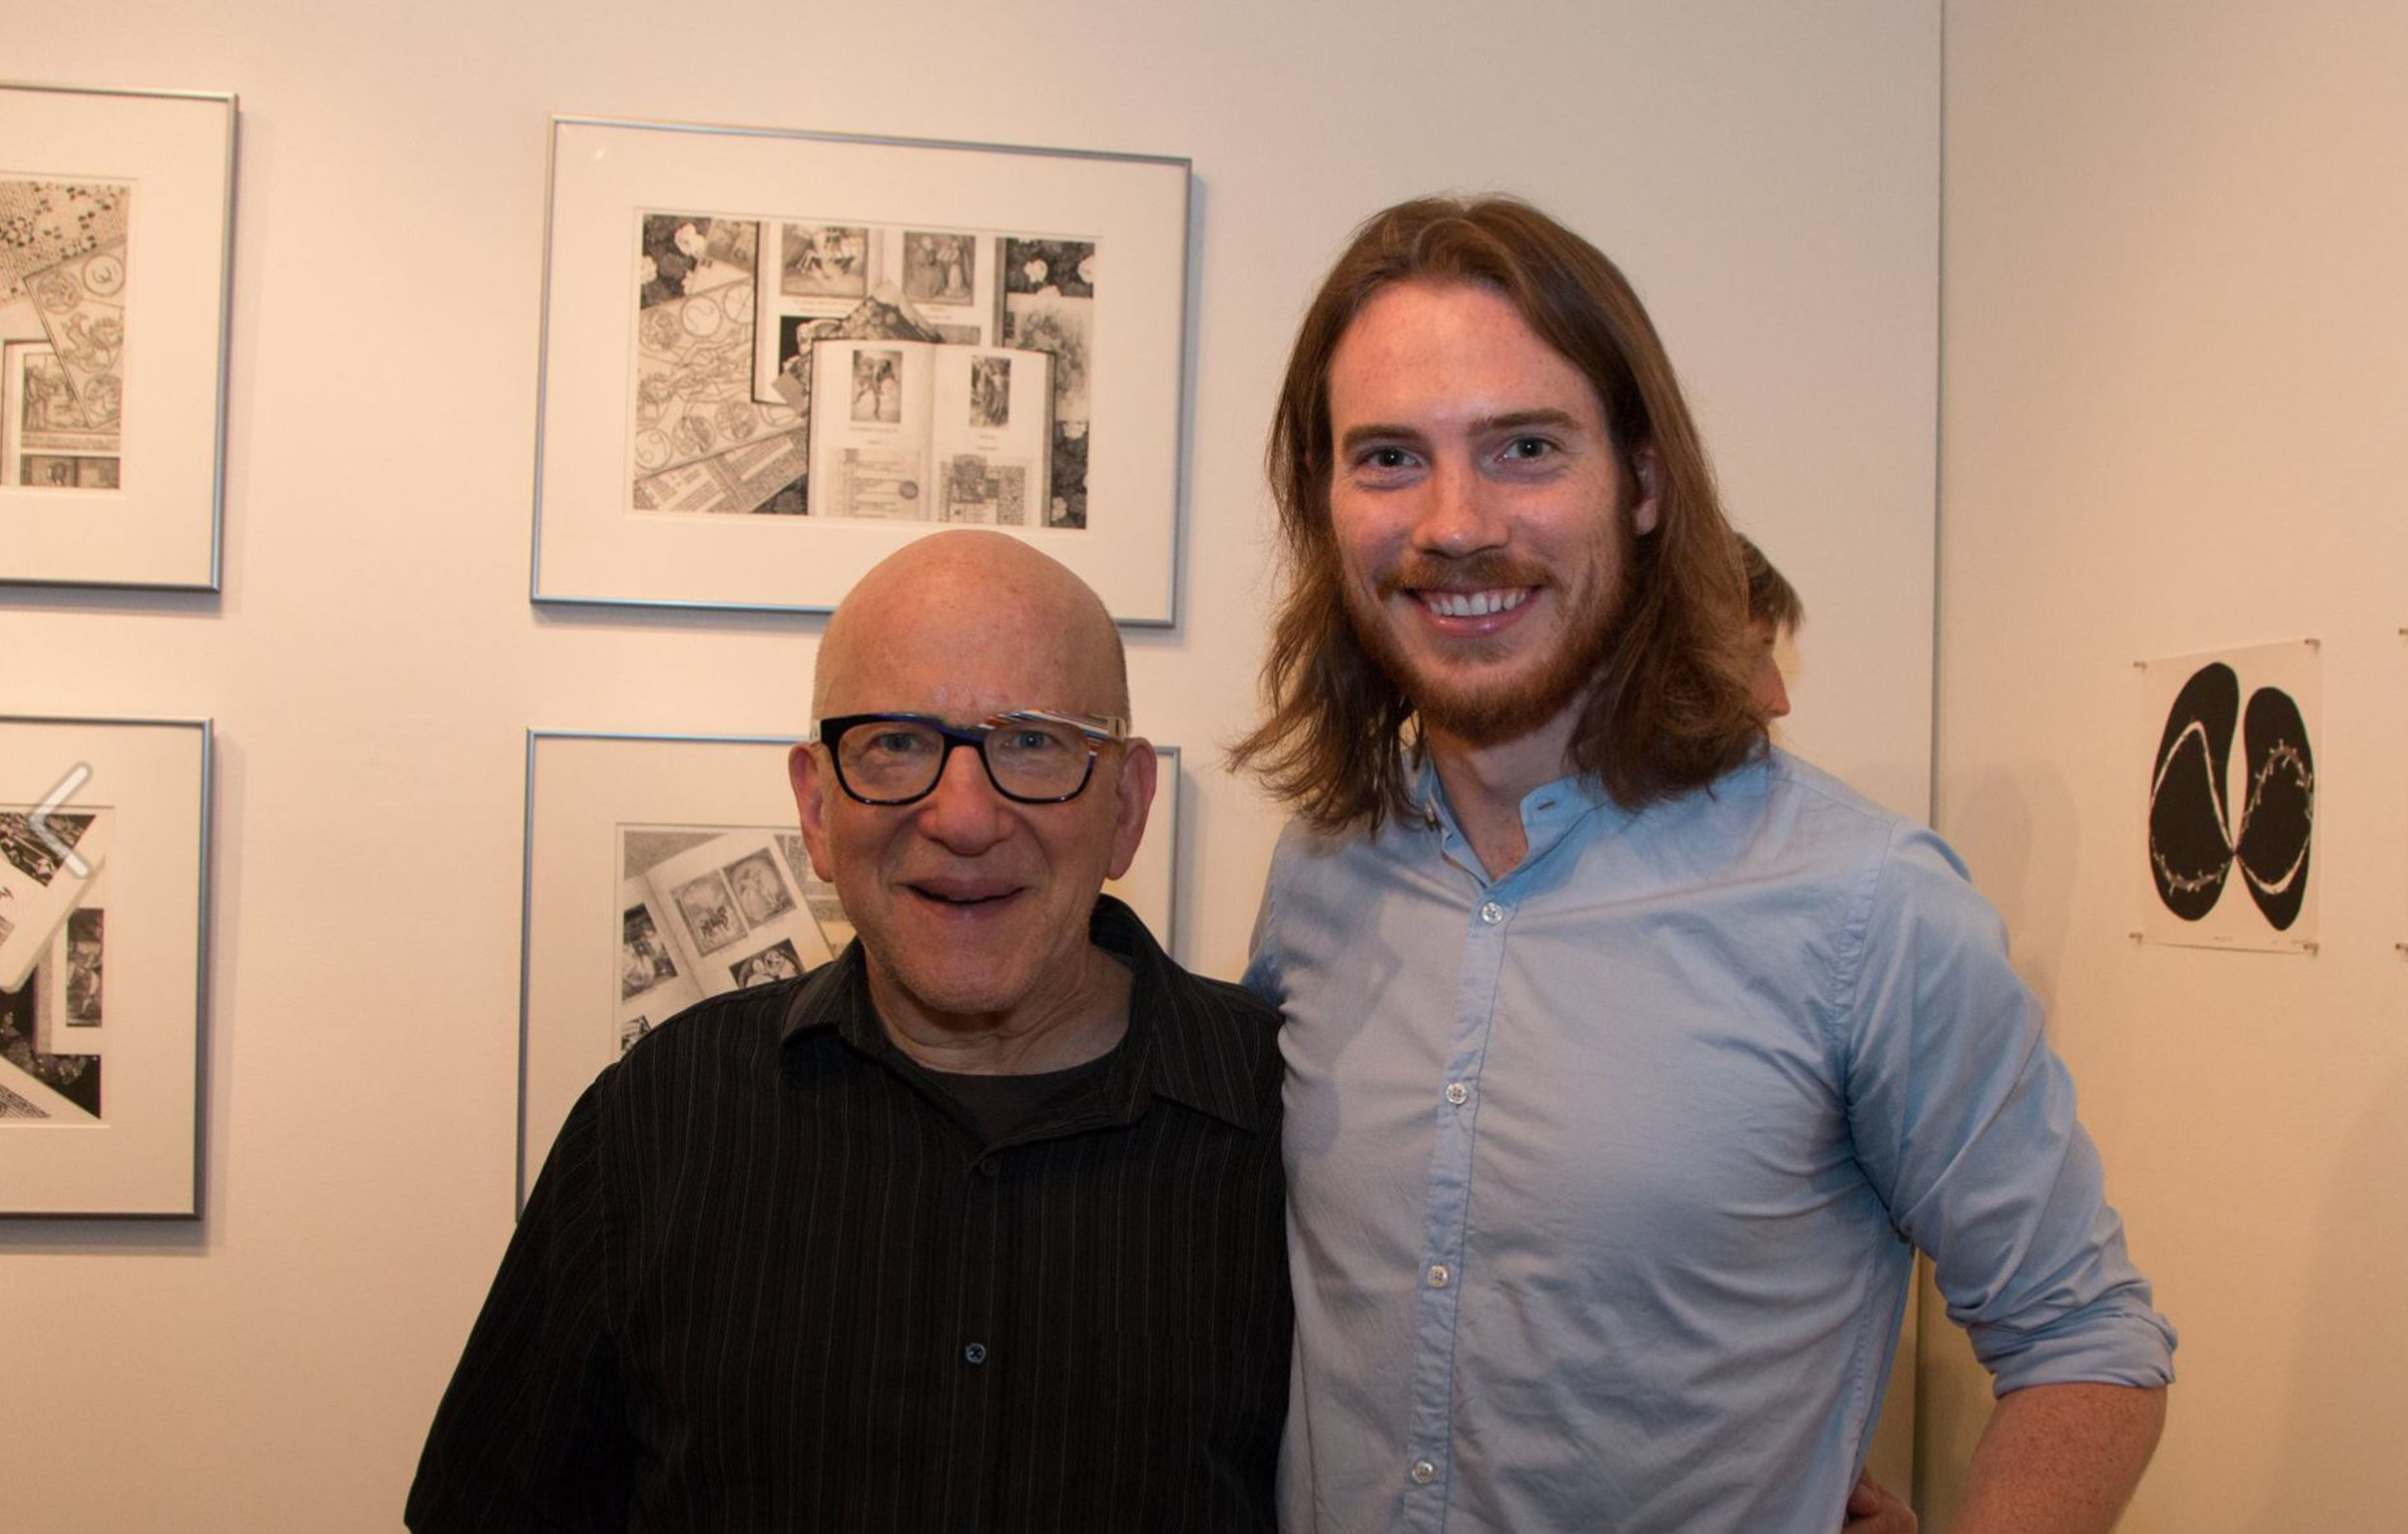 Barry Blinderman and Michael Blake. Phot courtesy: Justine Kaszynski Photography.